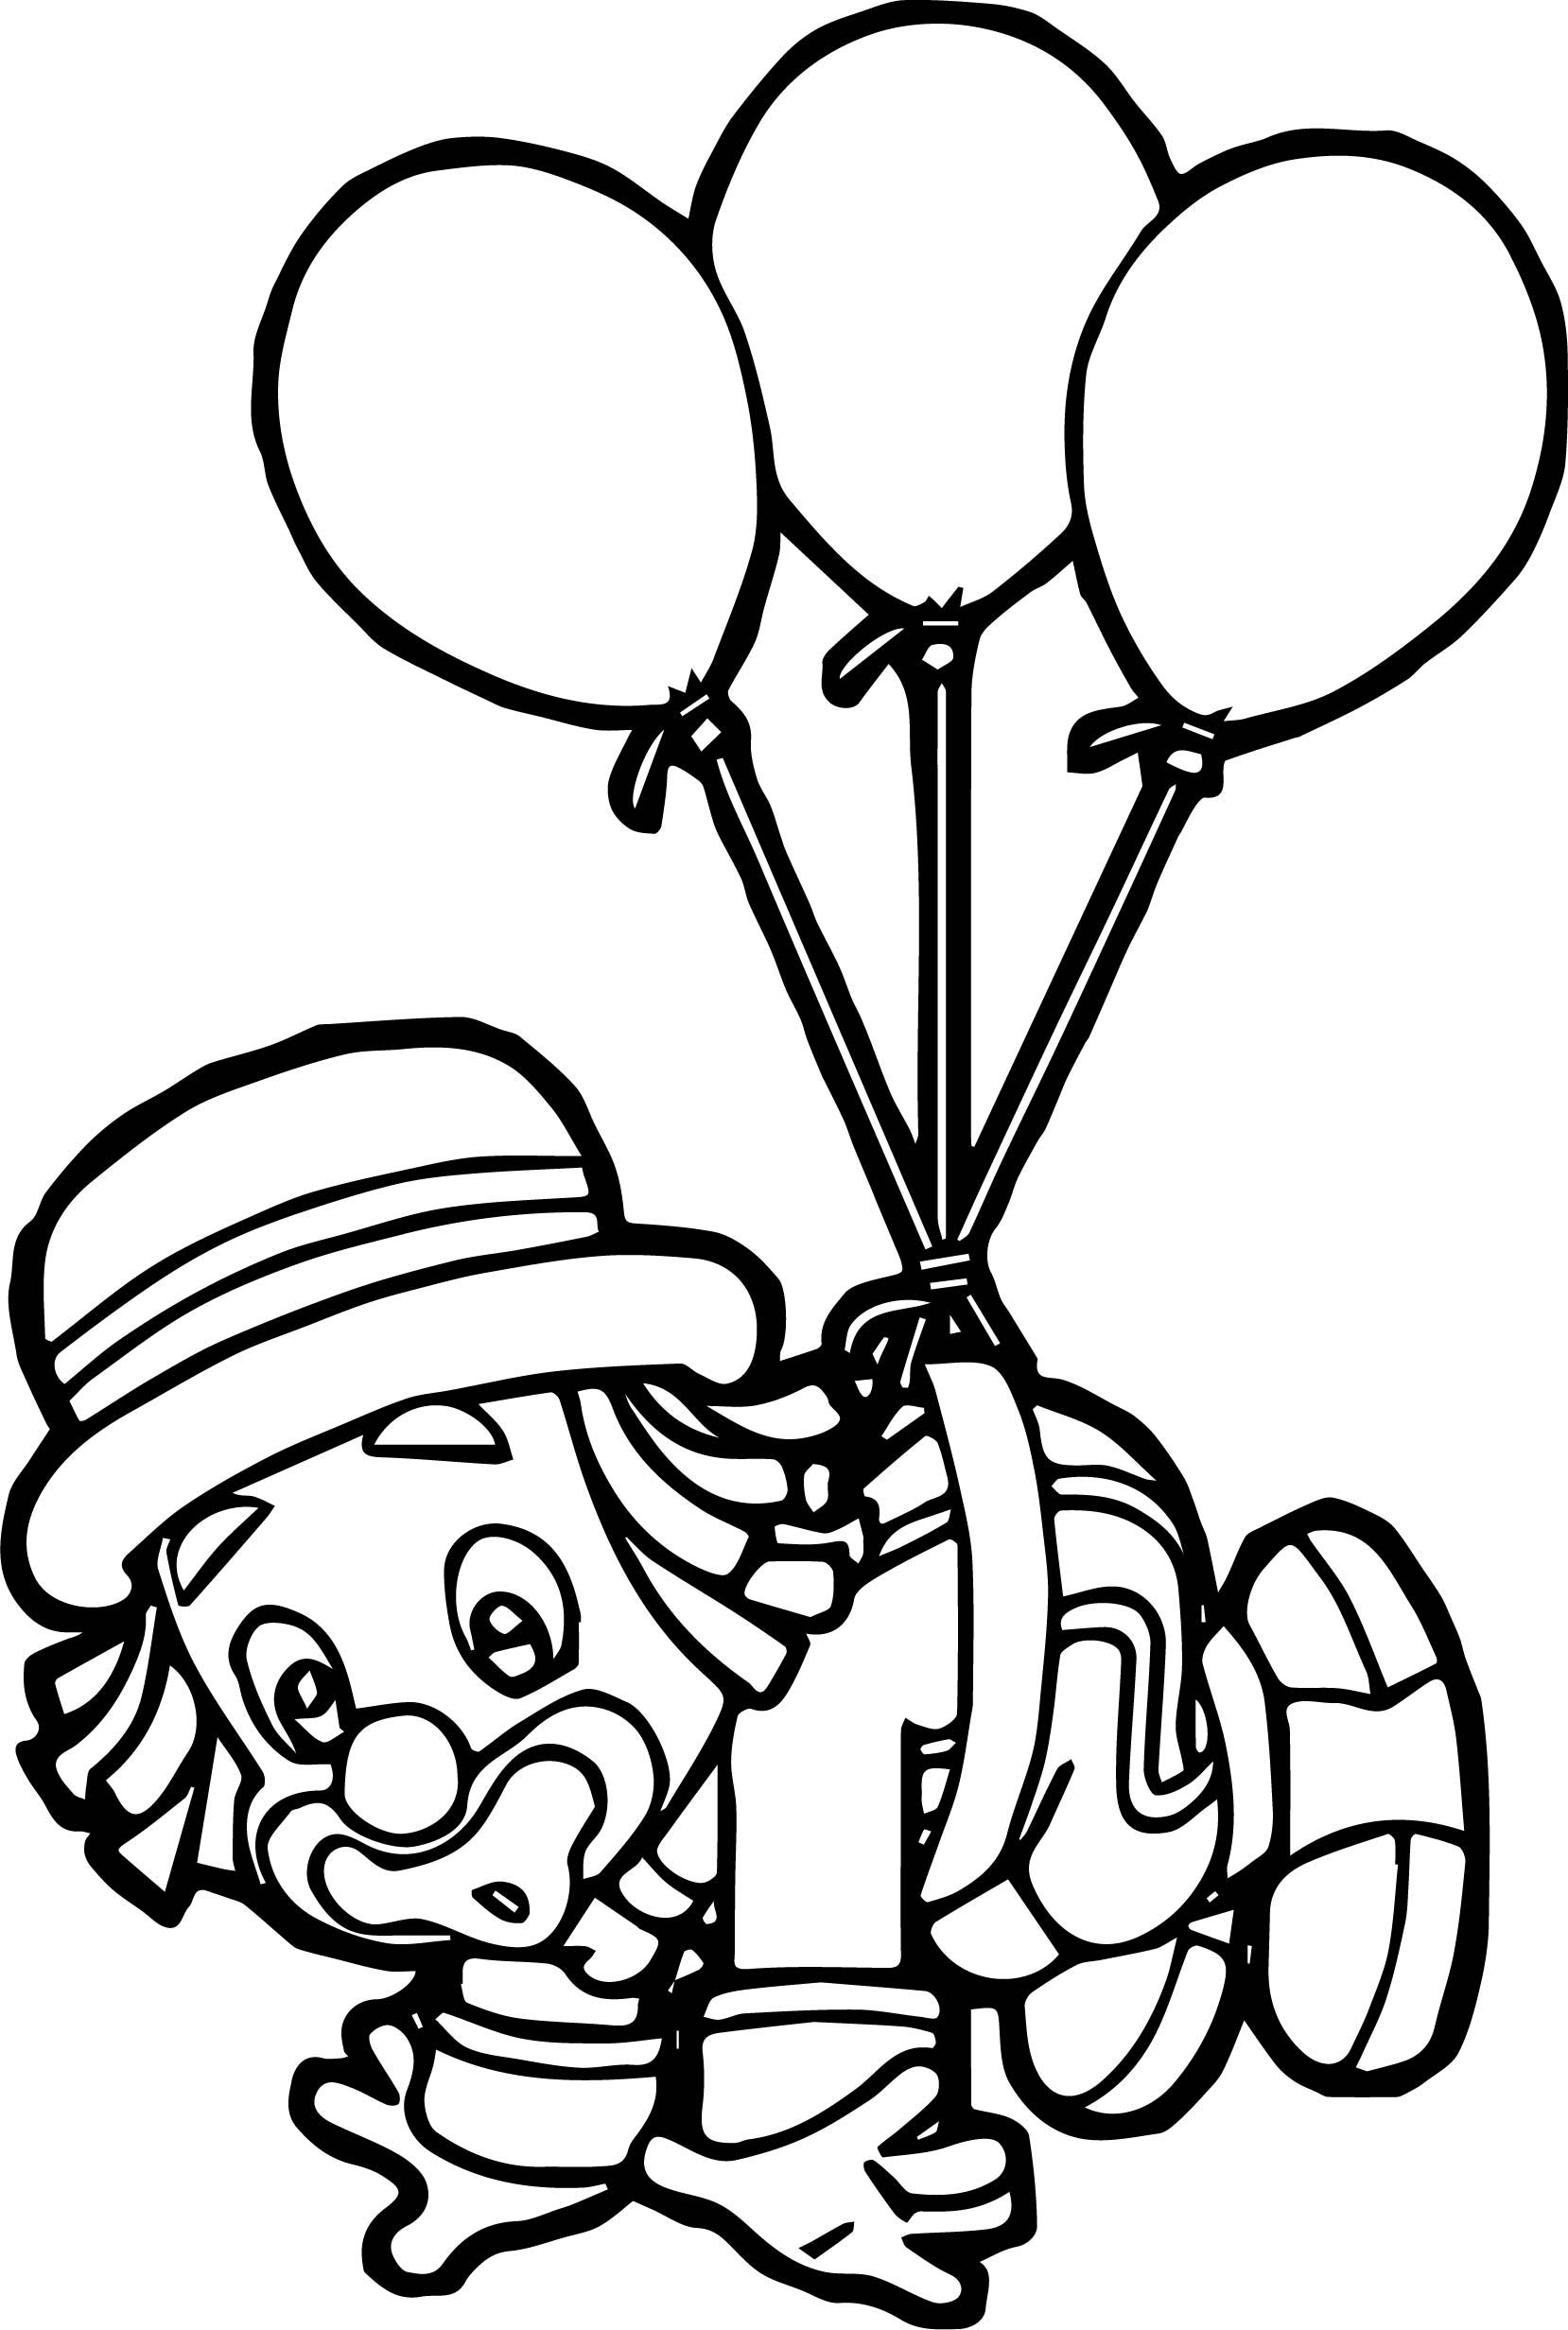 Cool Patati Patata Clown Coloring Page Coloring Pages Coloring Books Coloring Pages For Kids